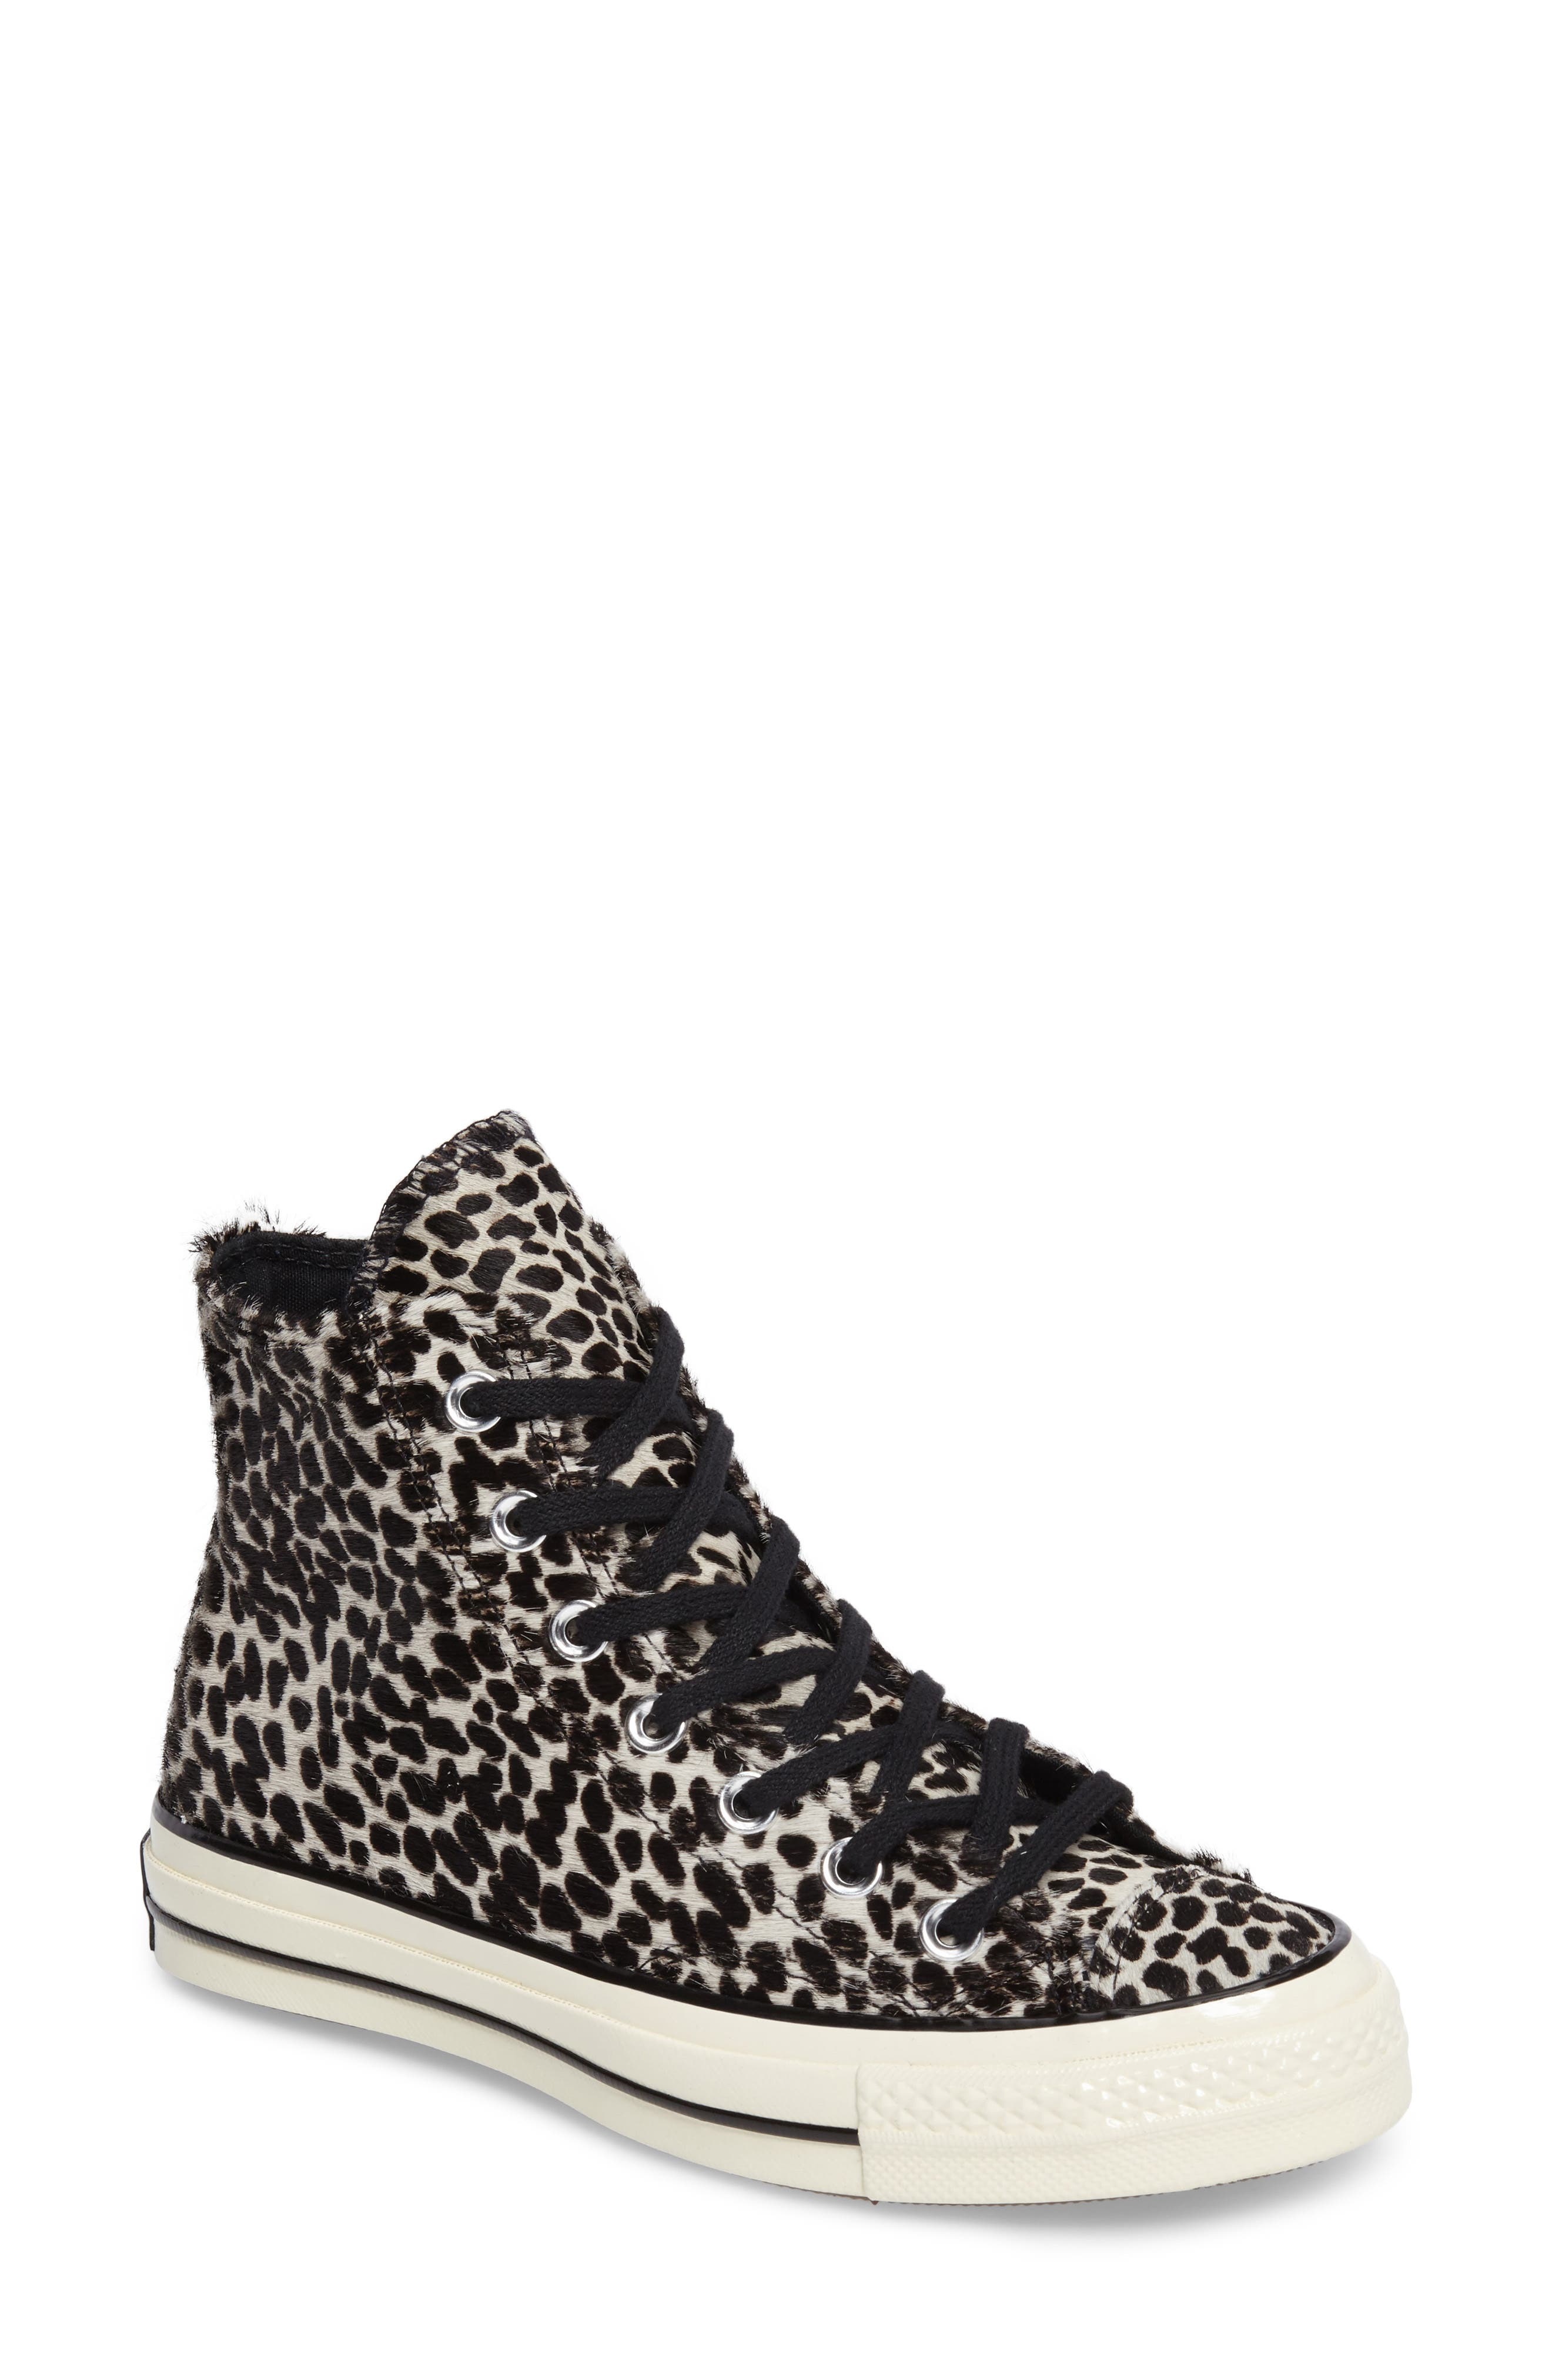 Alternate Image 1 Selected - Converse Chuck Taylor® All Star® 70 Genuine Calf Hair High Top Sneaker (Women)